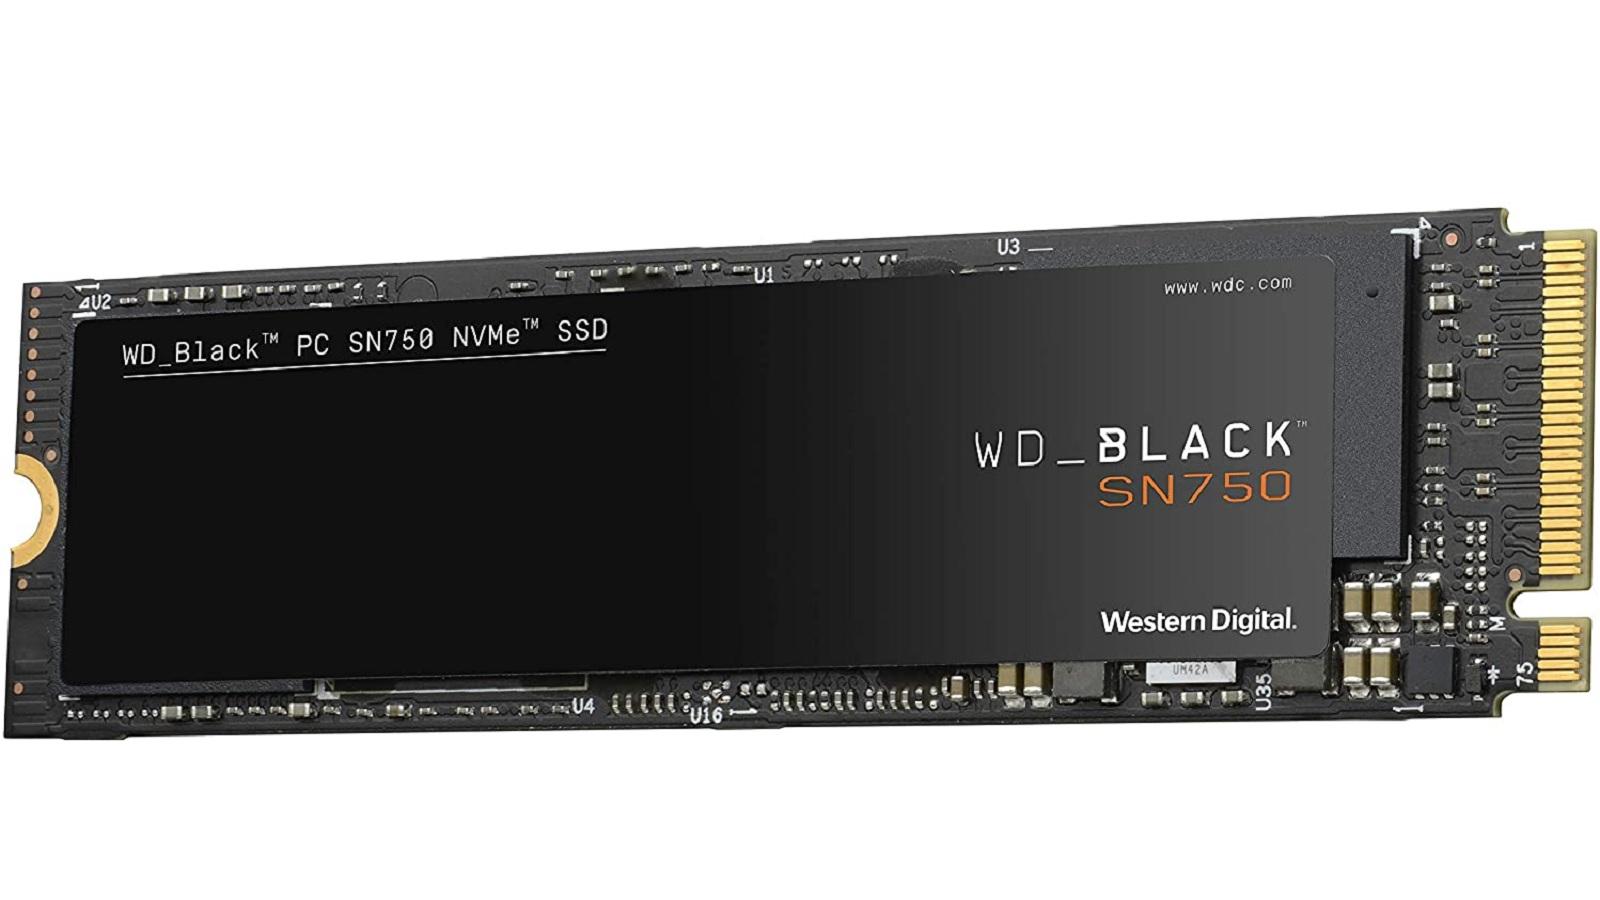 WD Black SN750 SSD